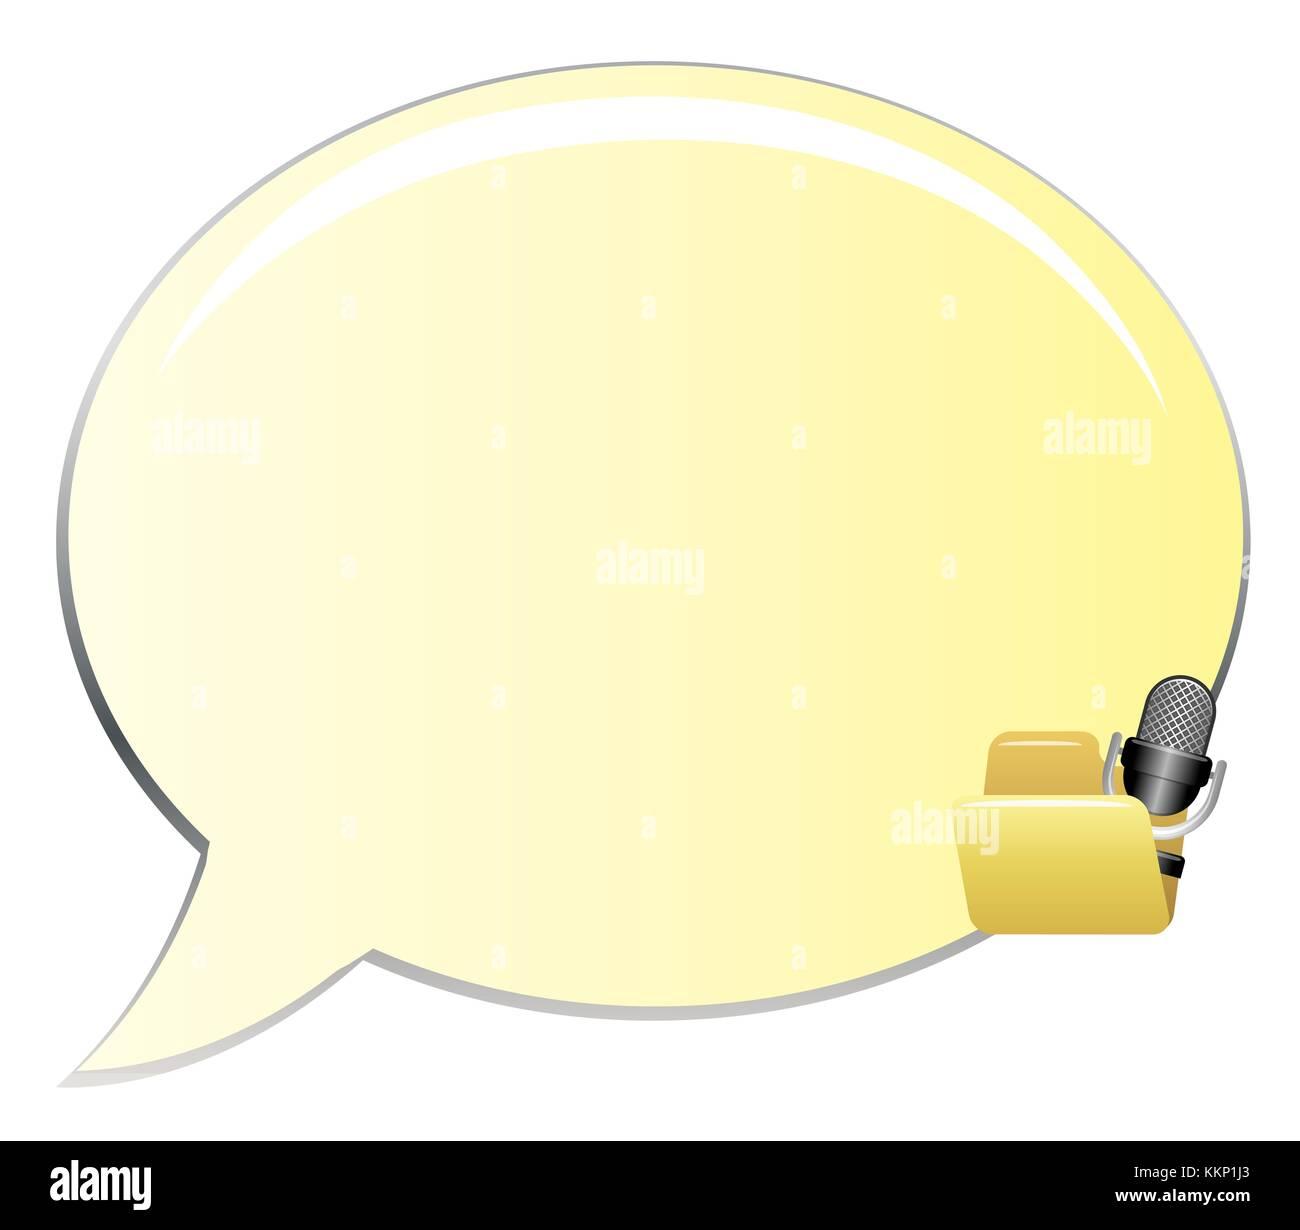 clip art yellow speech bubbles - Stock Image